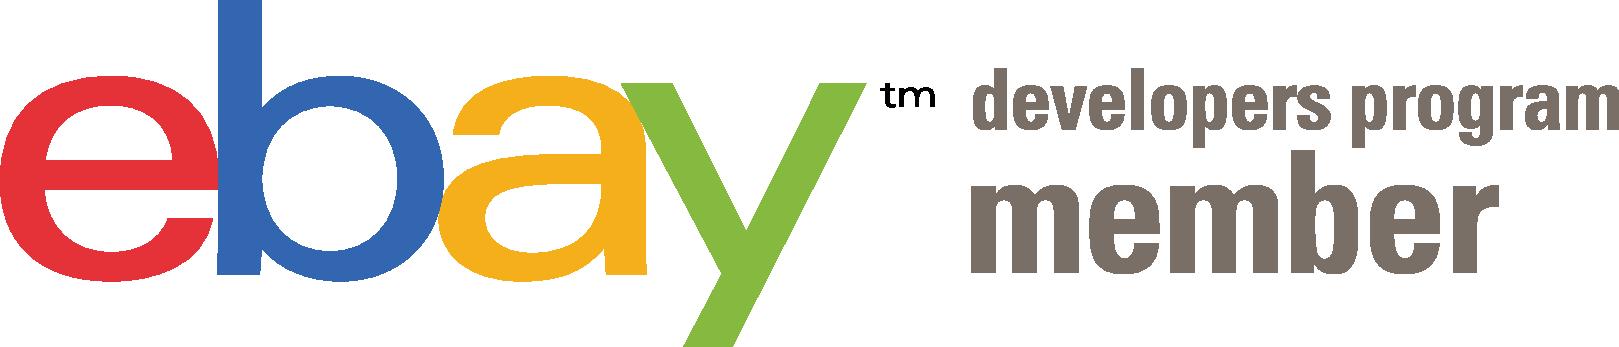 eBay Developers Program Logo